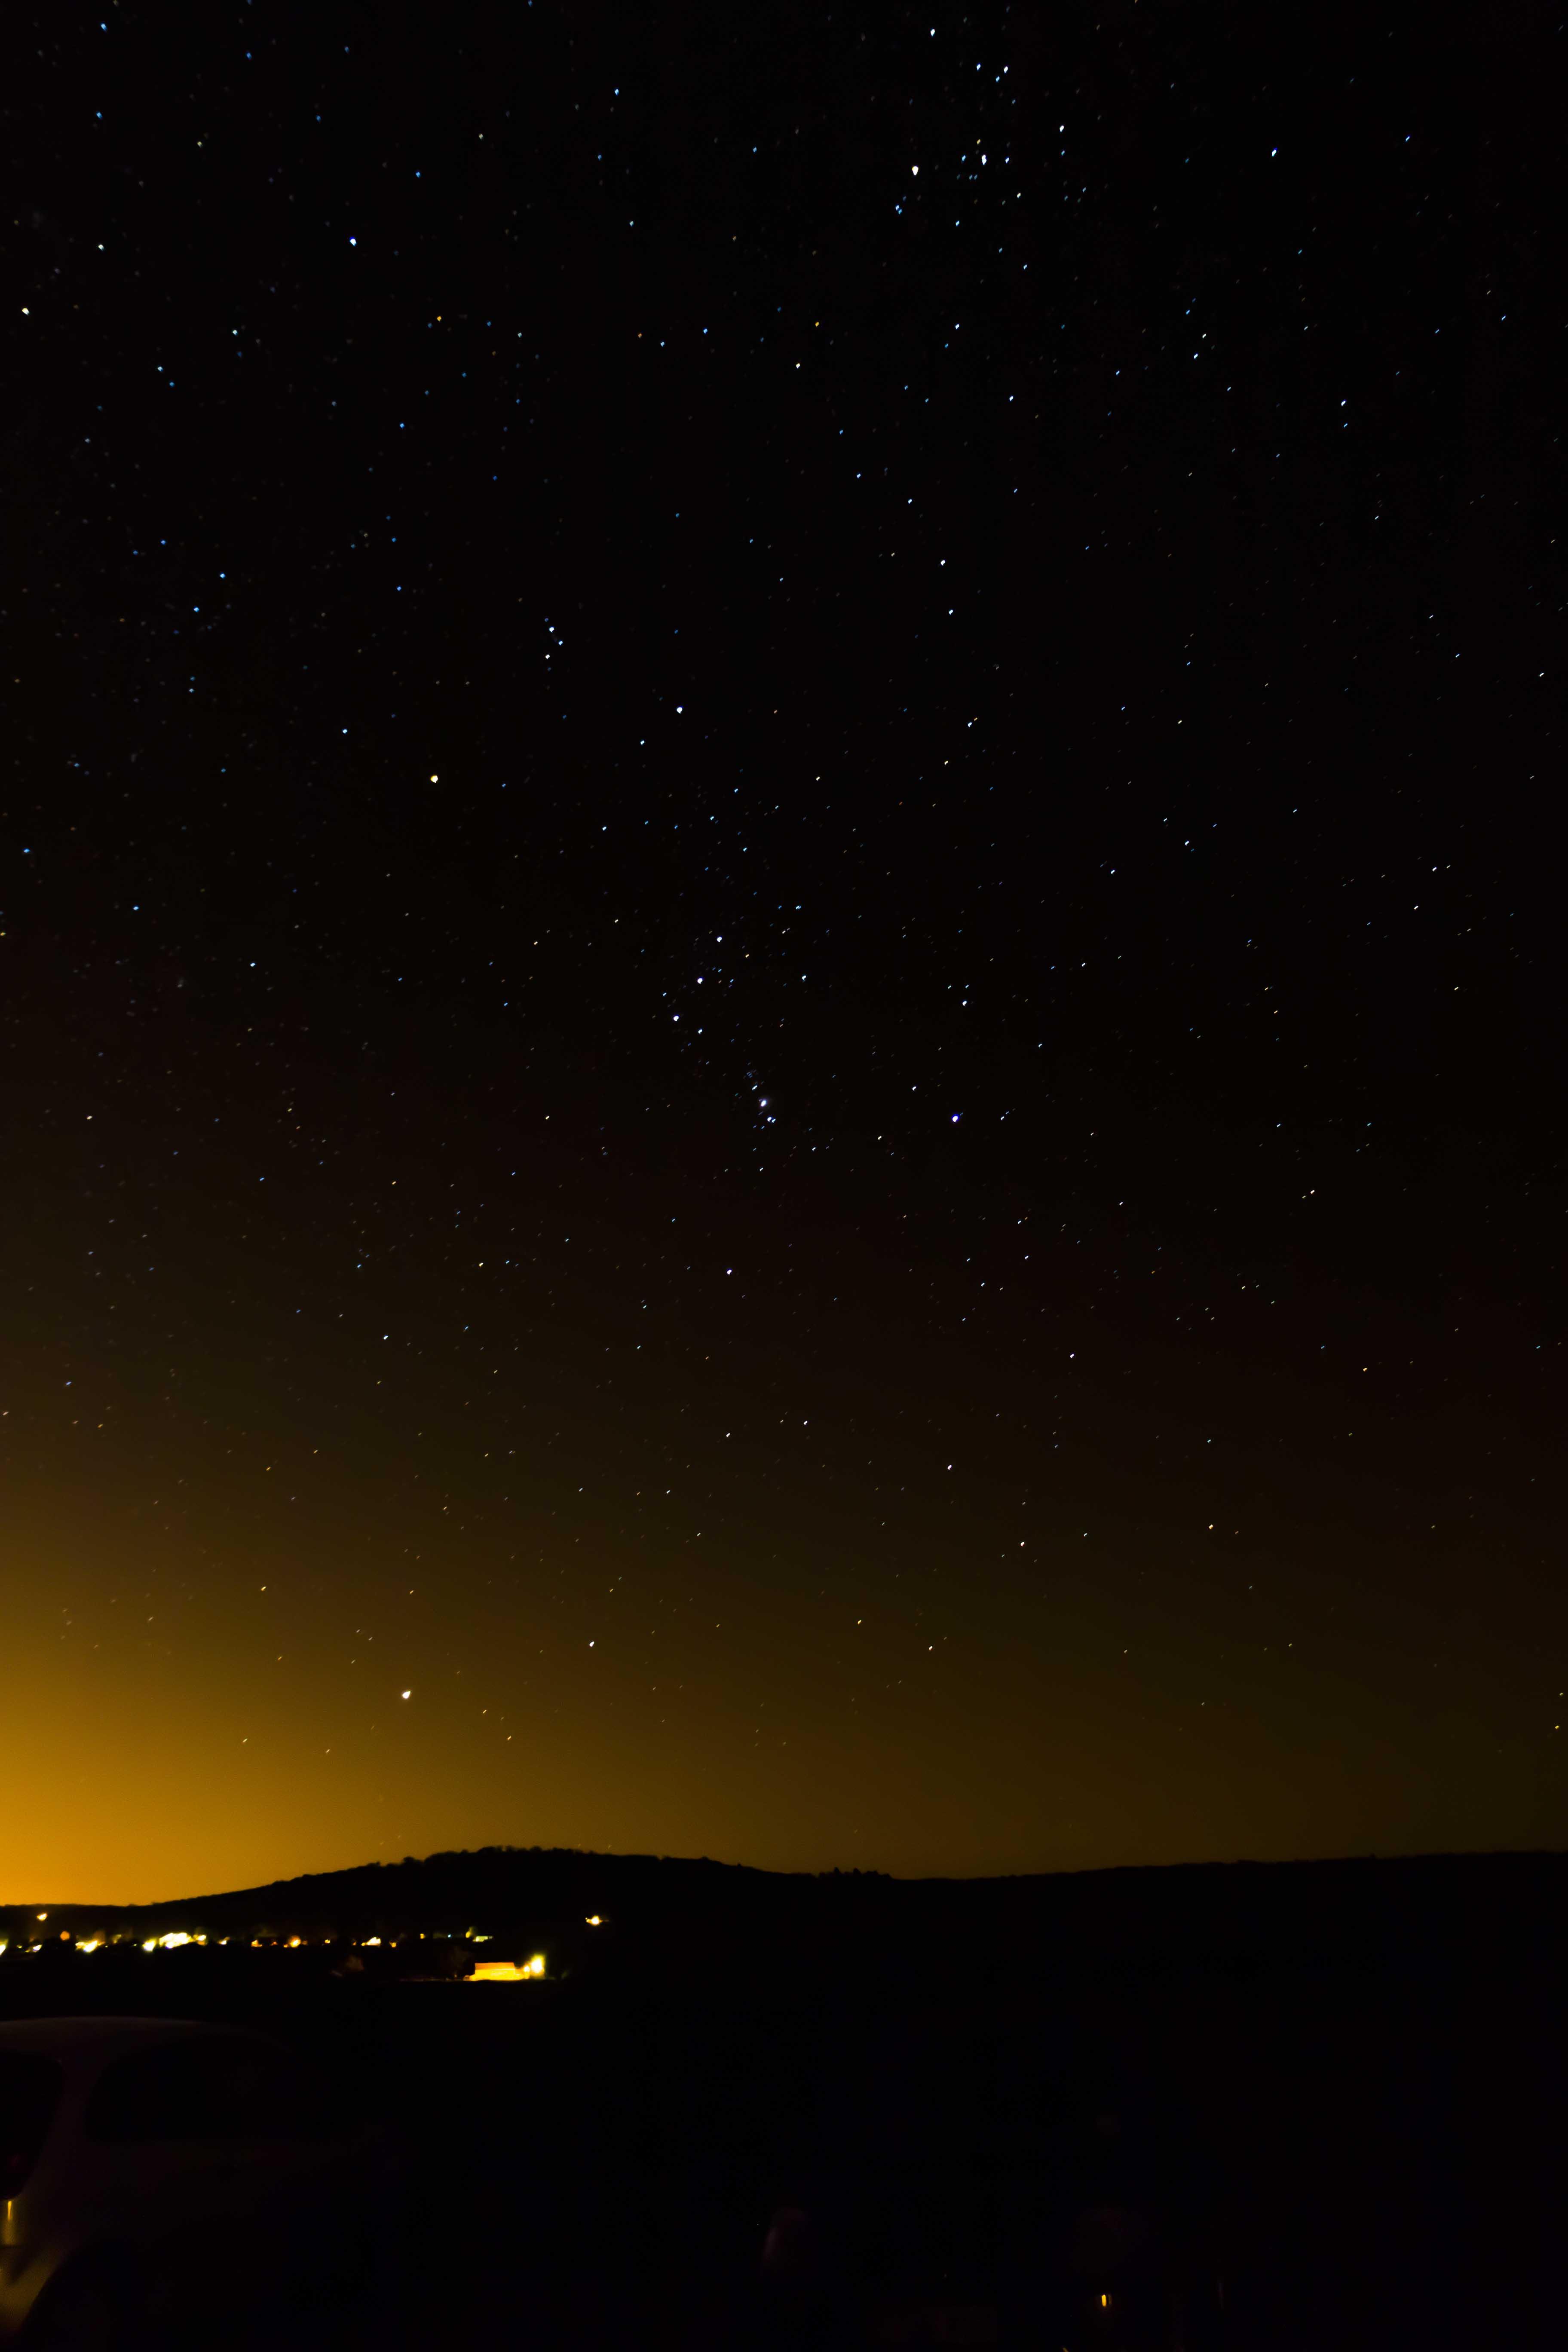 STARS-CITY-GLOW-2